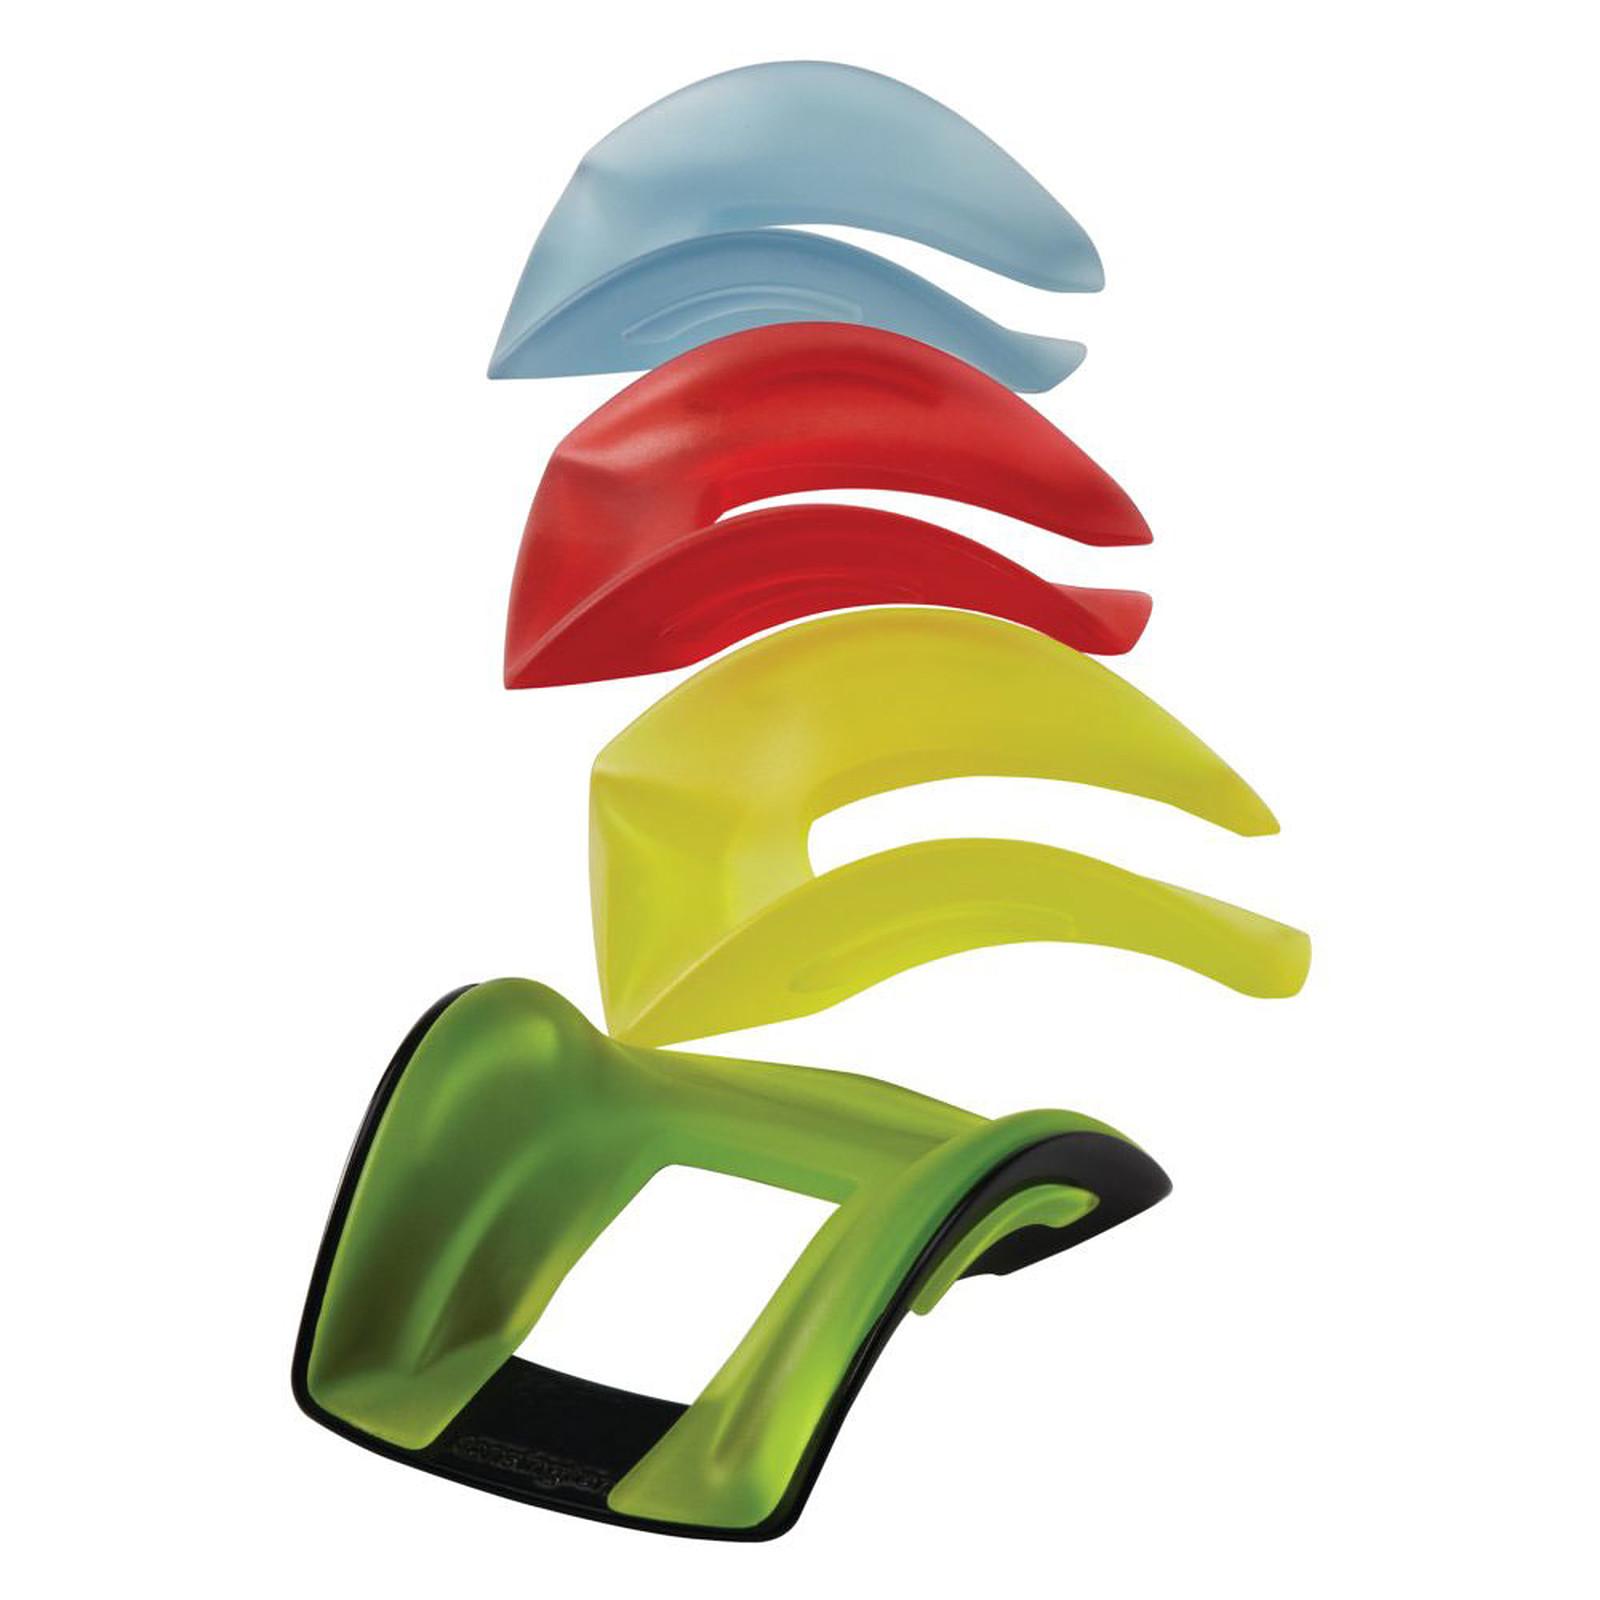 Kensington SmartFit Comform Wrist Rest